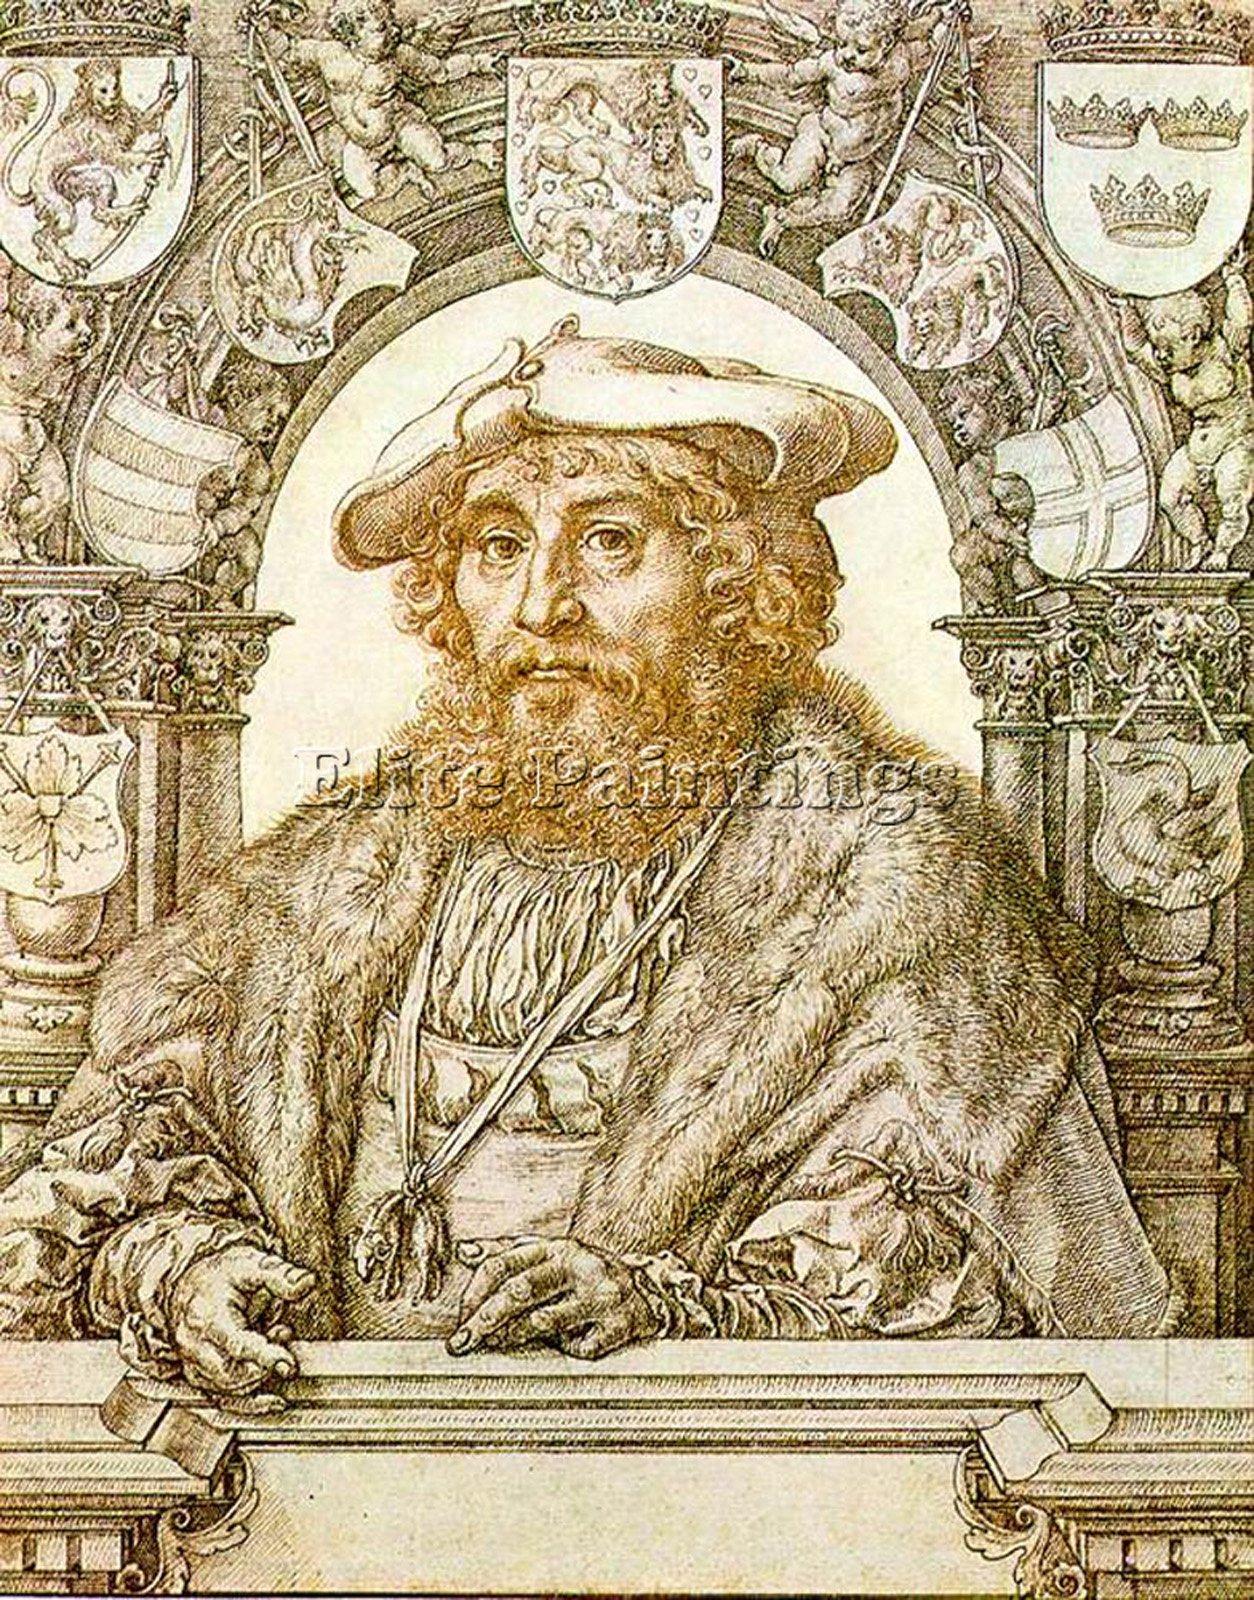 GOSSAERT JAN PORTRAIT CHRISTIAN II KING DENMARK ARTIST PAINTING OIL CANVAS REPRO 48x40inch by Elite-Paintings